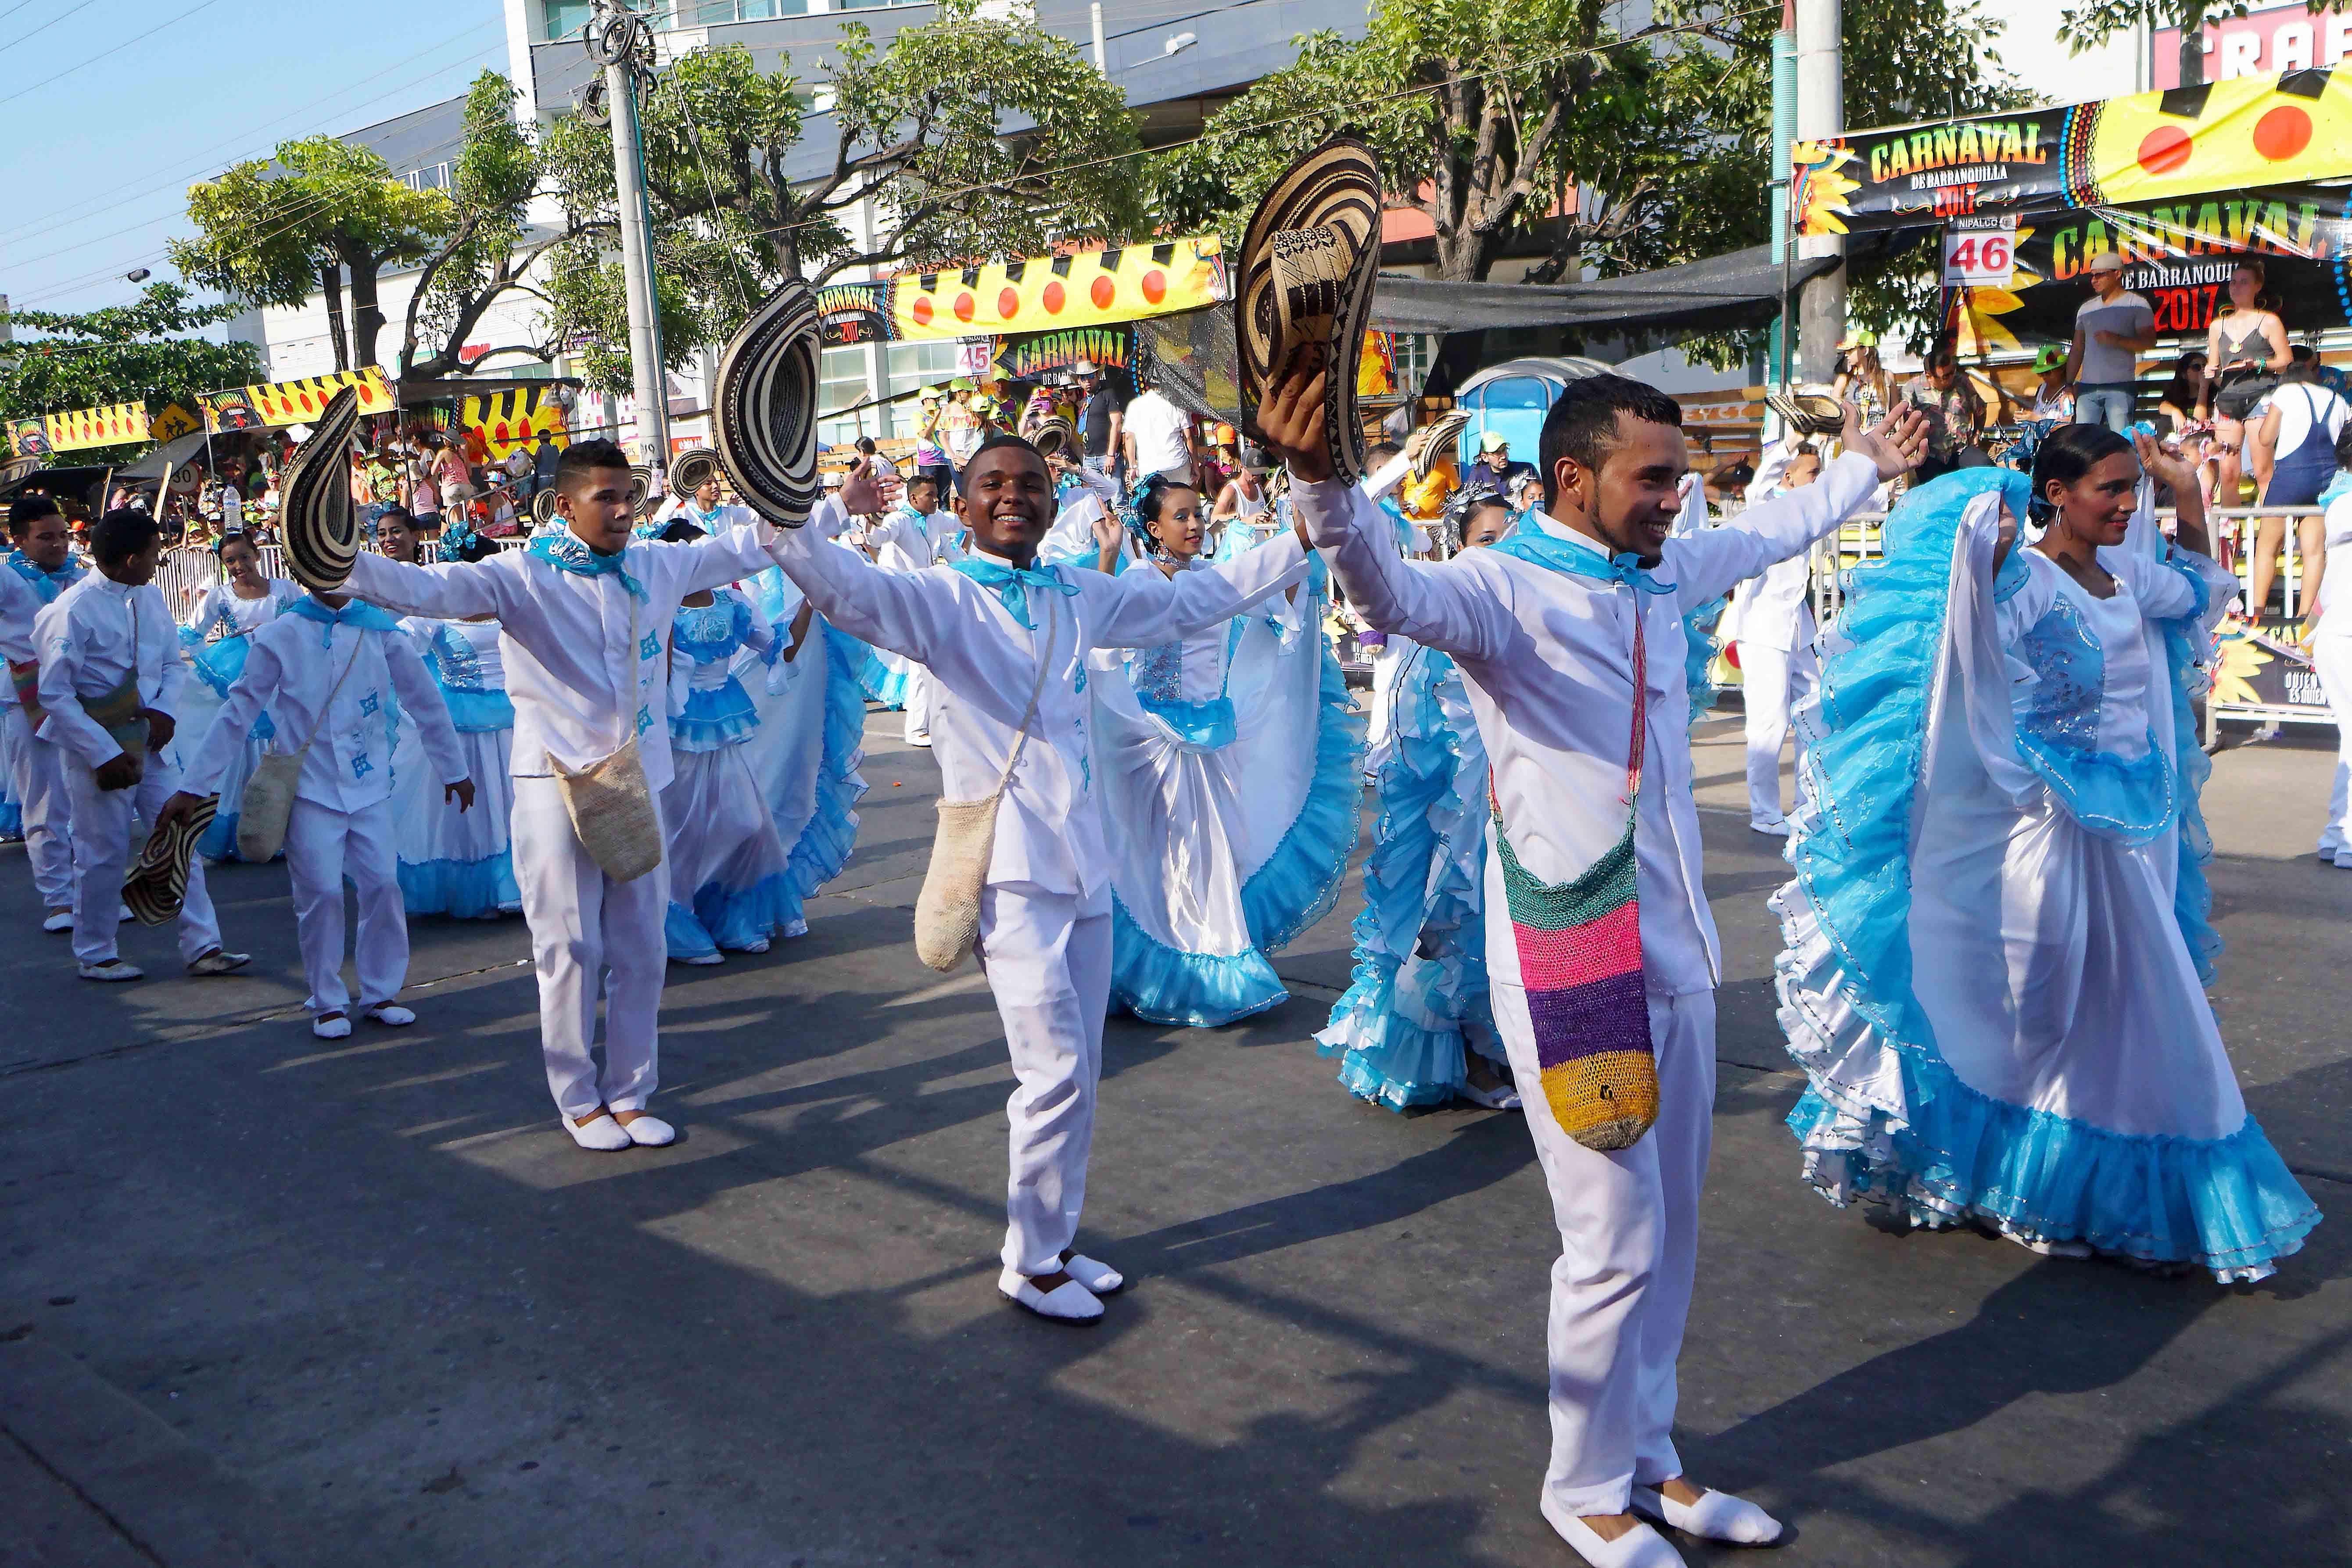 51 Carnaval Hats in Air Dancing sm